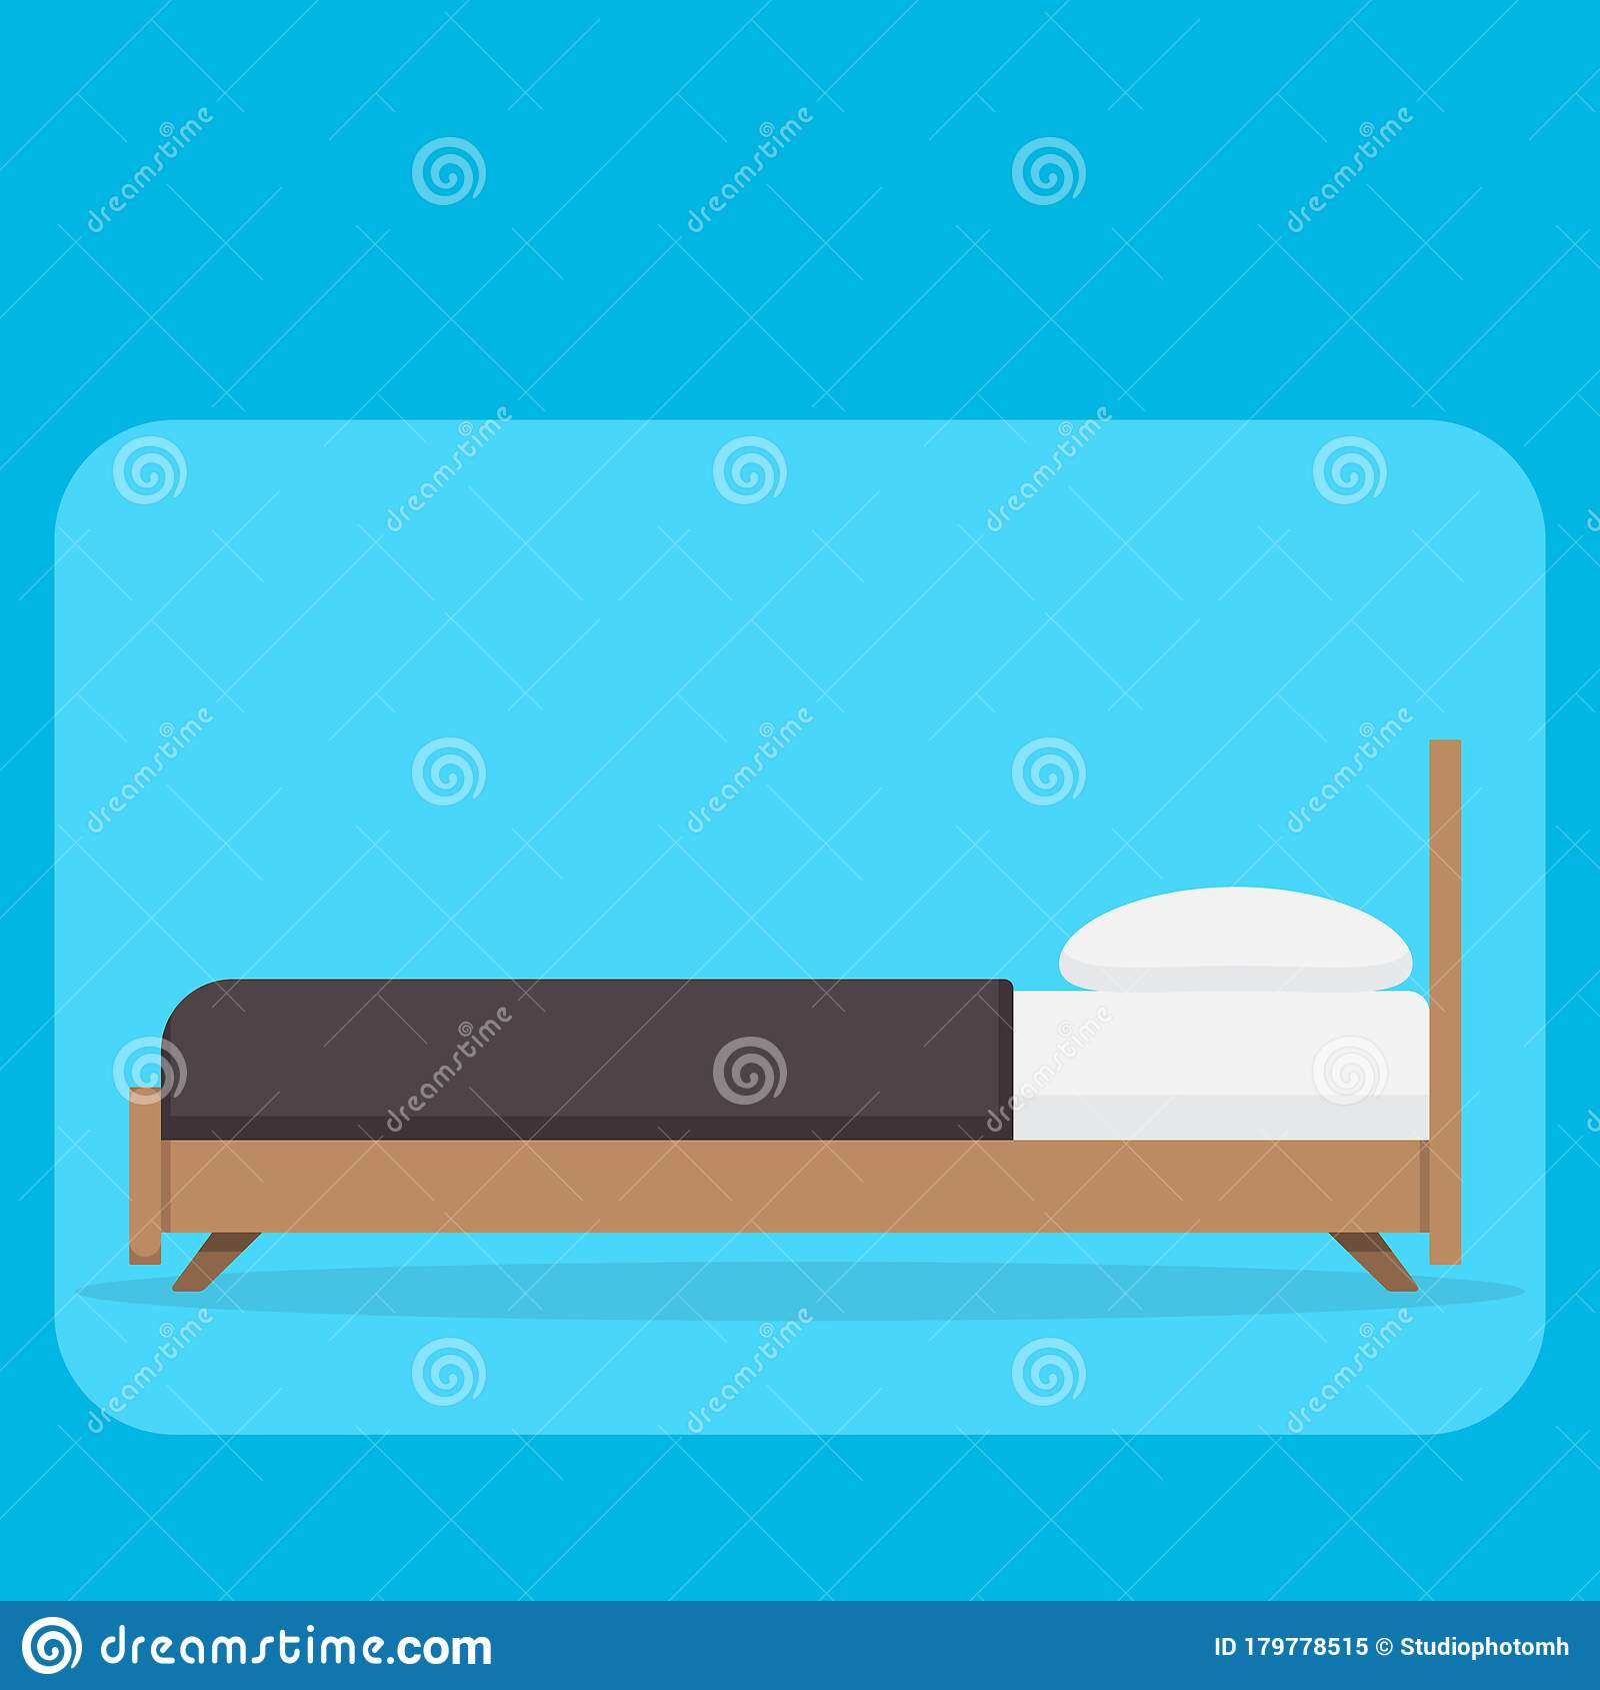 bed pillow and blanket side view flat duvet simple vector illustration stock vector illustration of blanket design 179778515